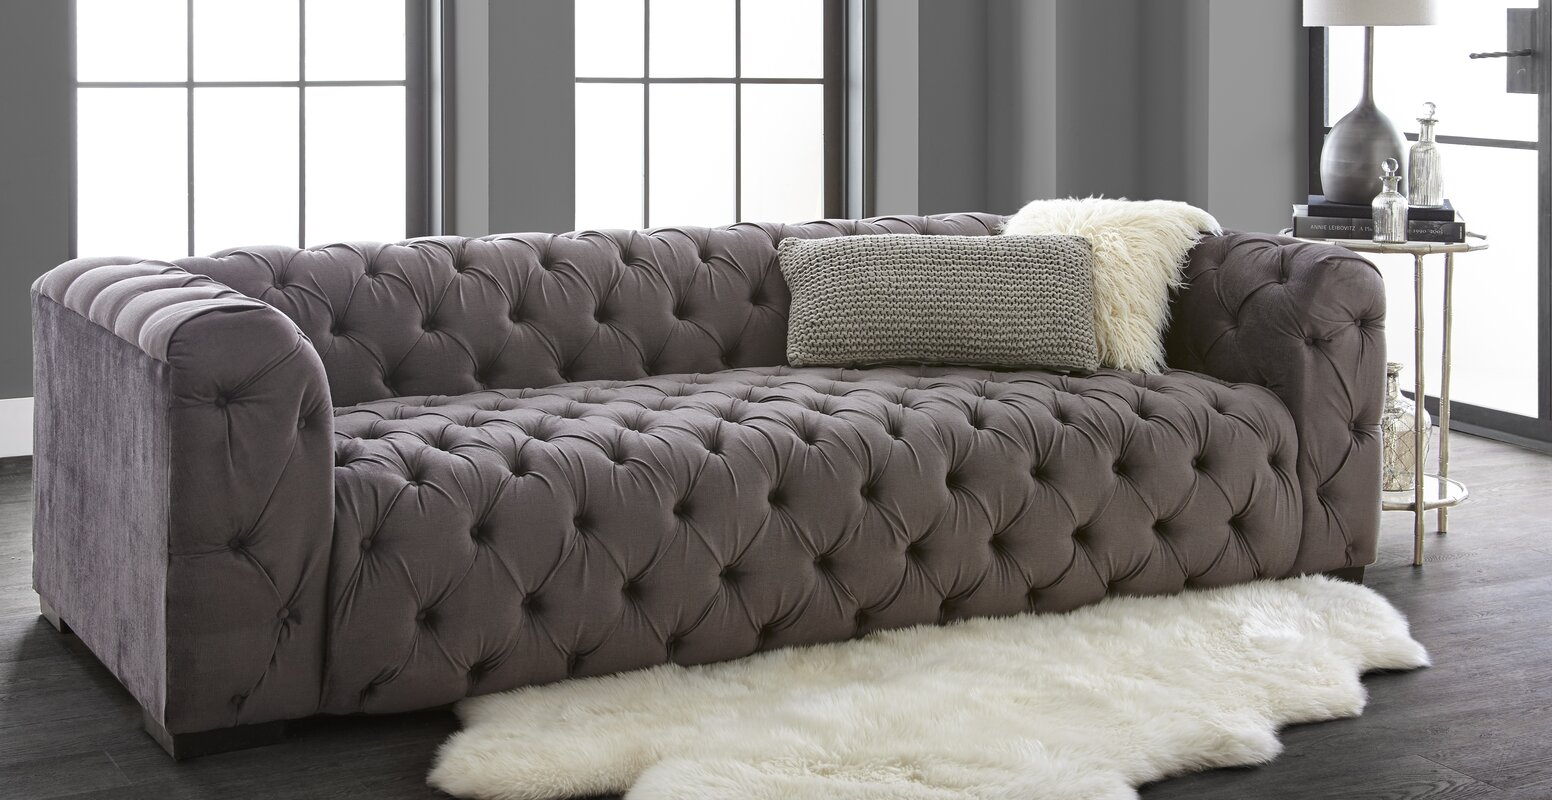 Home By Sean Amp Catherine Lowe Kensington Chesterfield Sofa